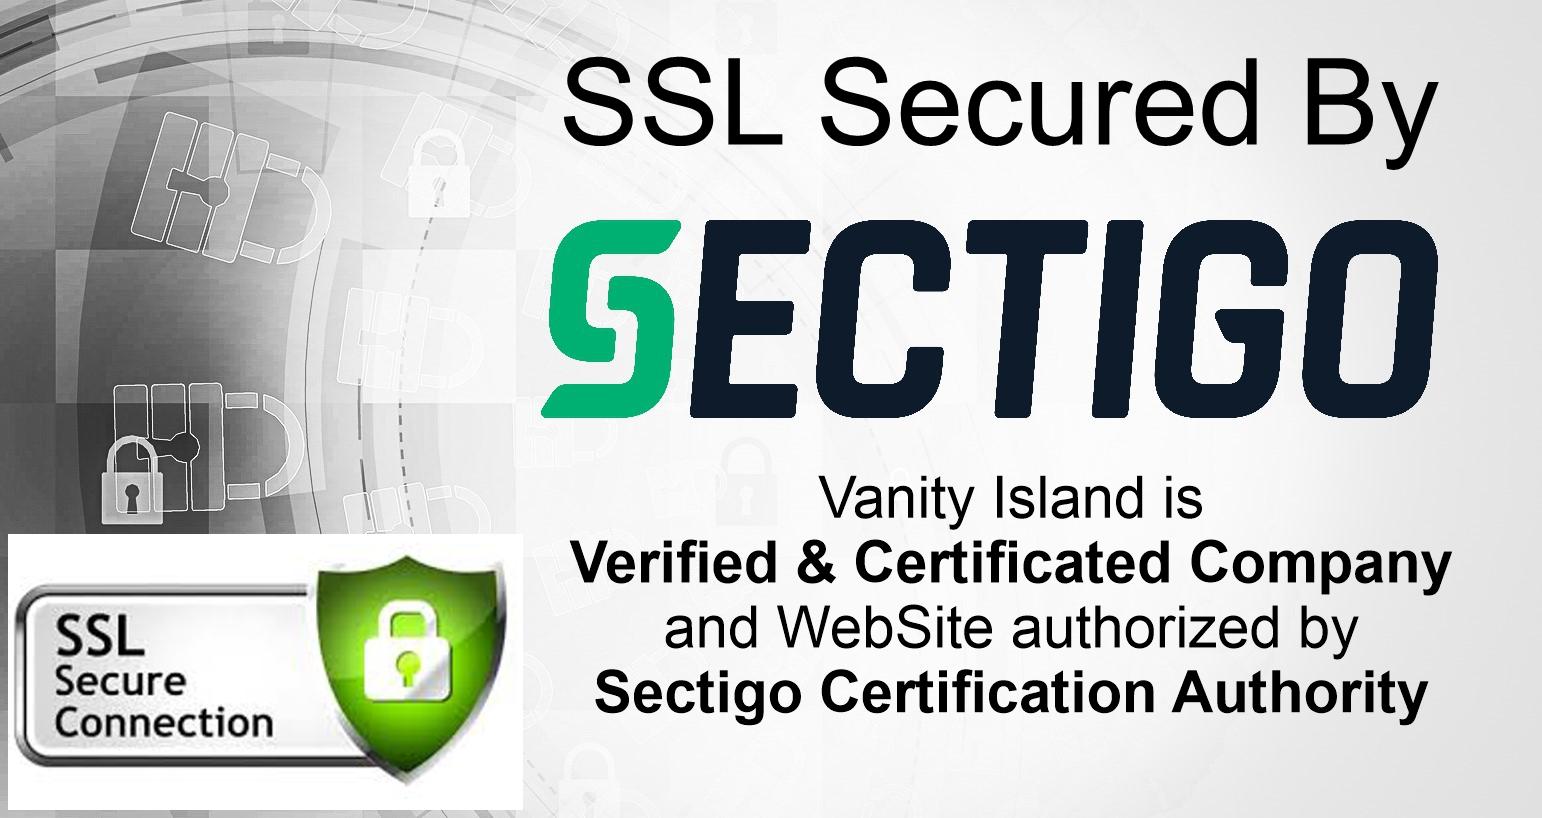 Sicurezza certificata SSL